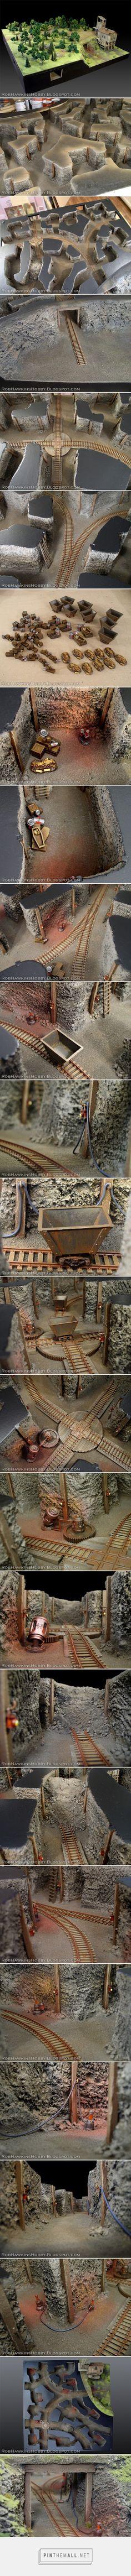 Rob Hawkins Hobby: WWX Terrain: Mine Tunnels - created via http://pinthemall.net